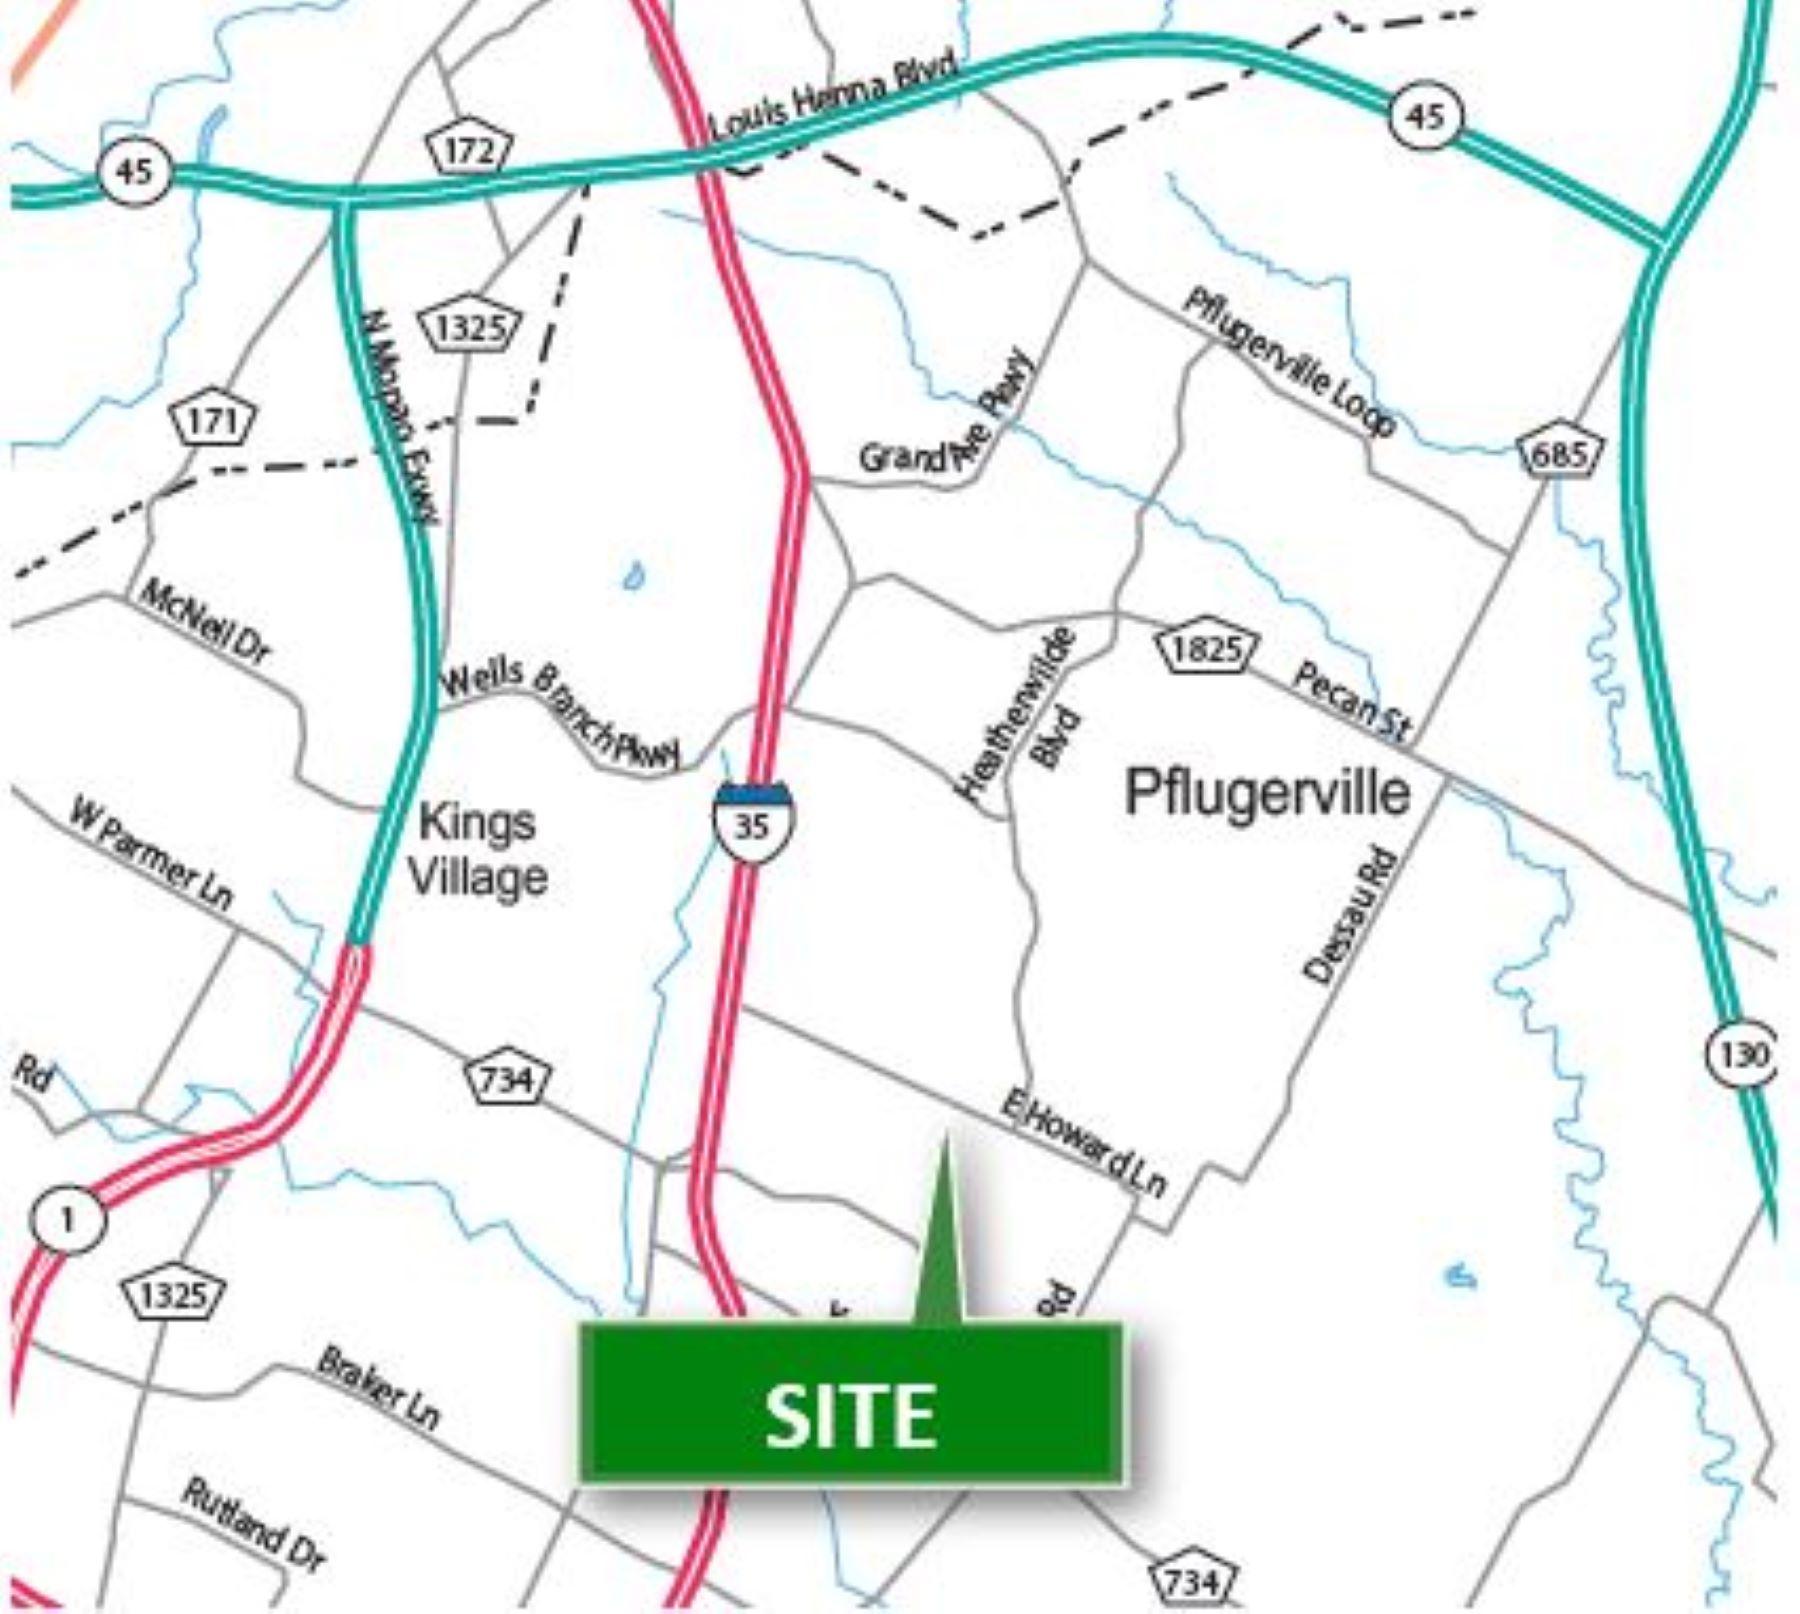 Tech-Ridge-Site-Map-new.JPG